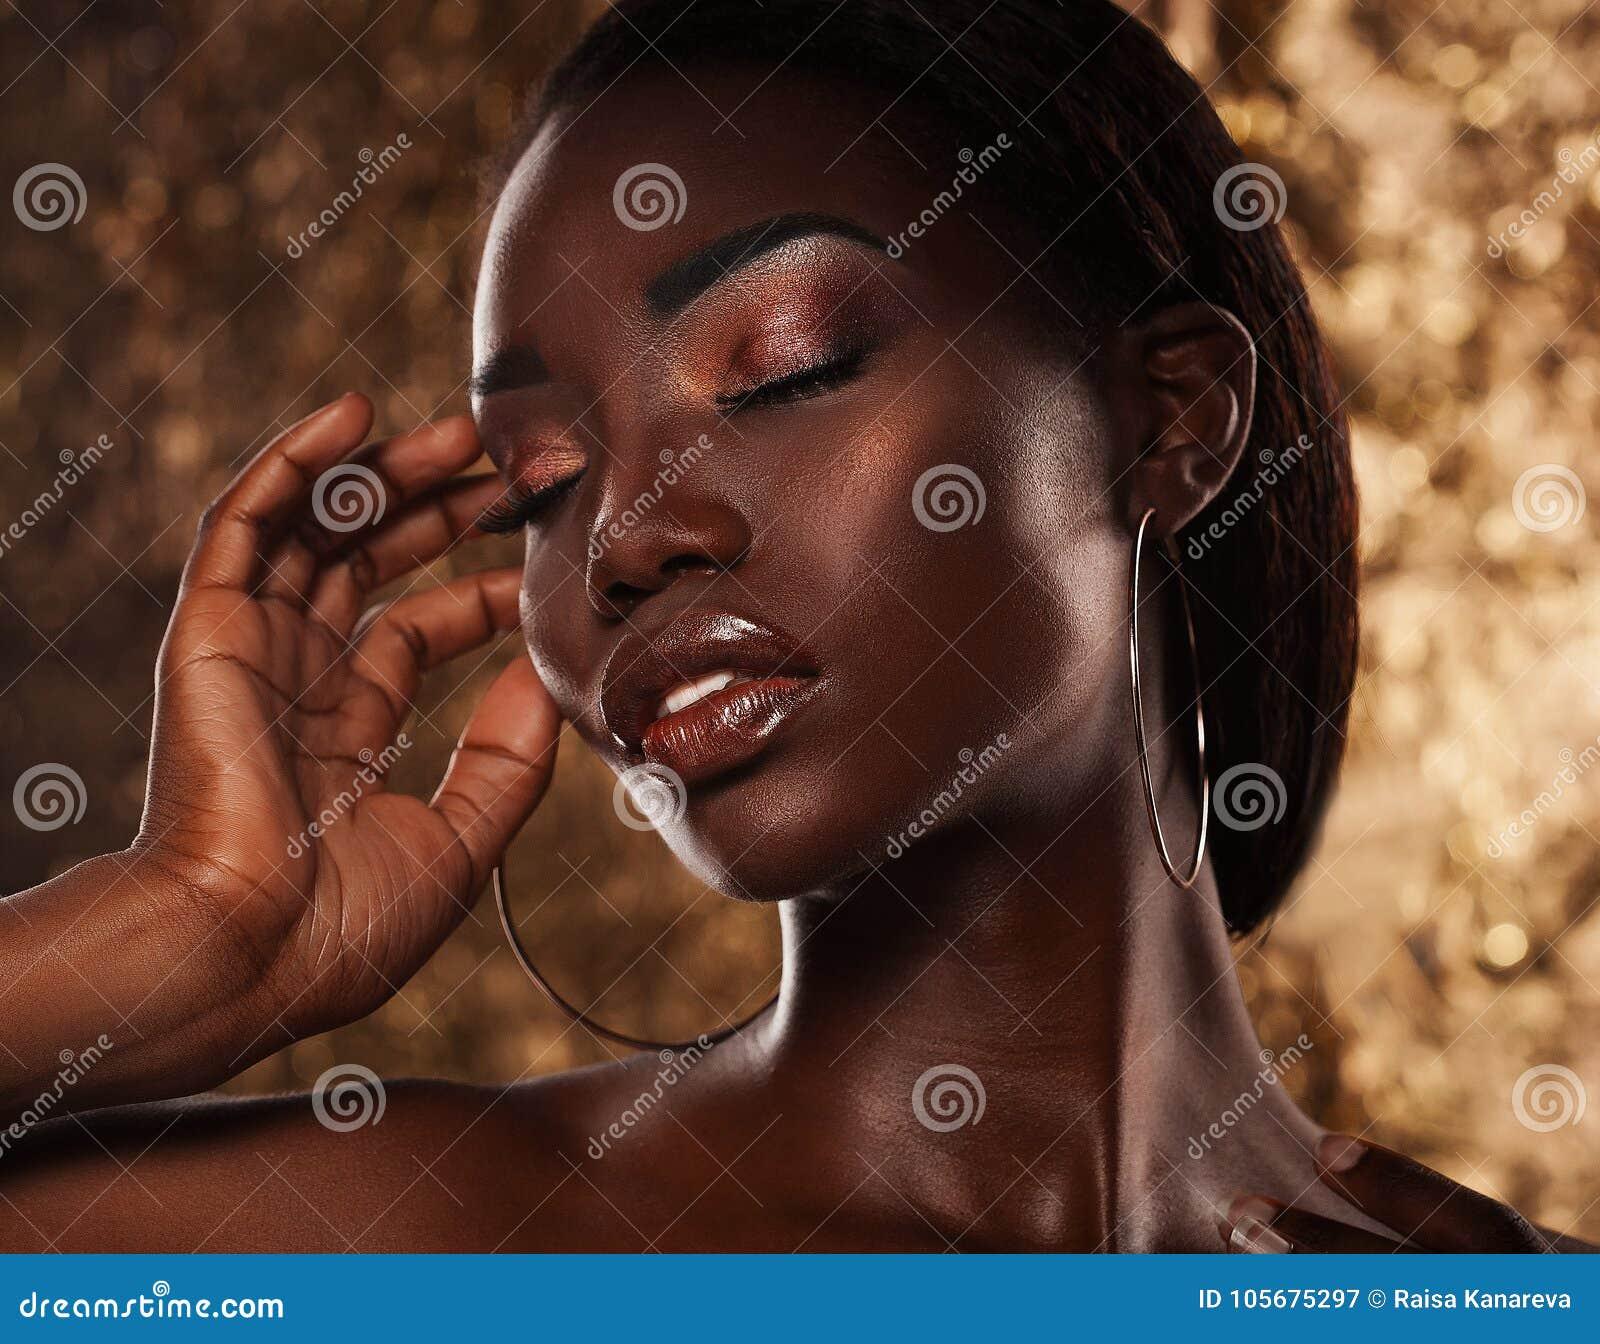 Fashion Studio Portrait Of An Extraordinary Beautiful African